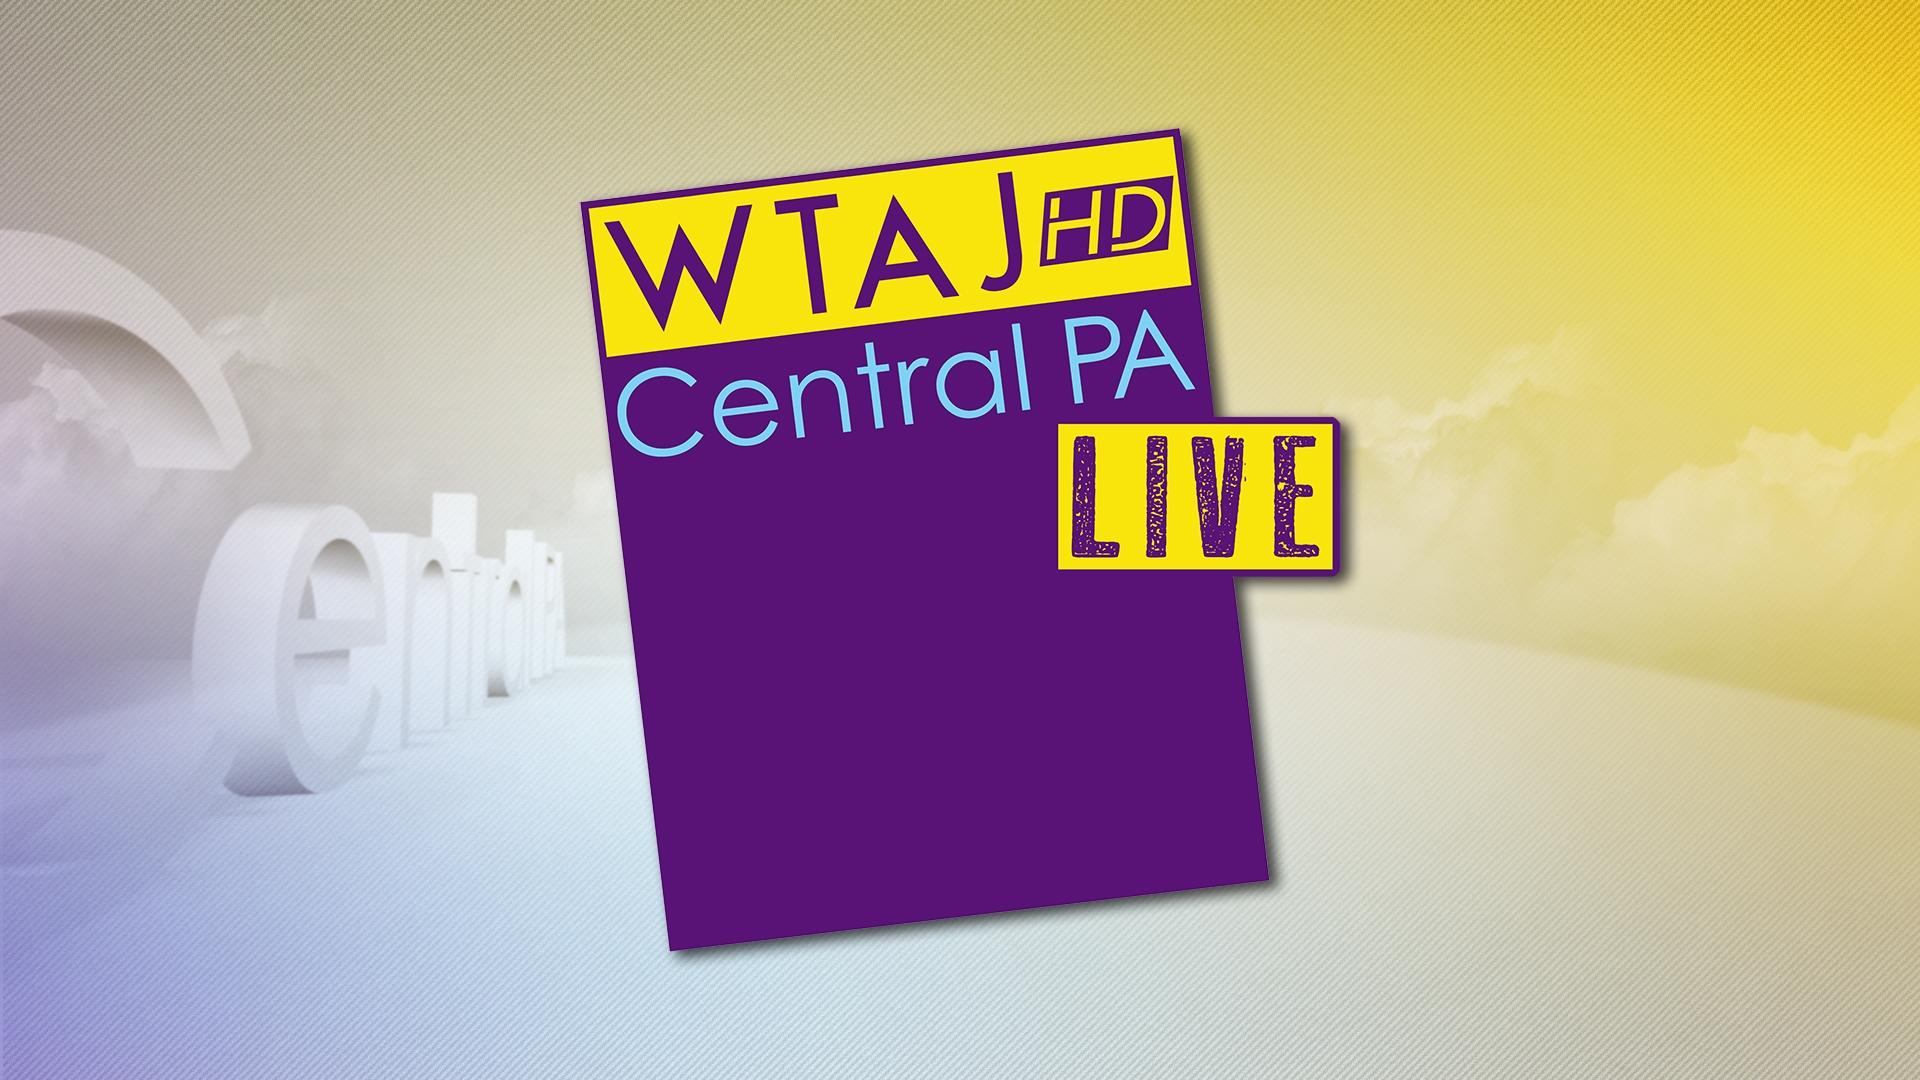 Central PA Live Logo_1436380756156.JPG